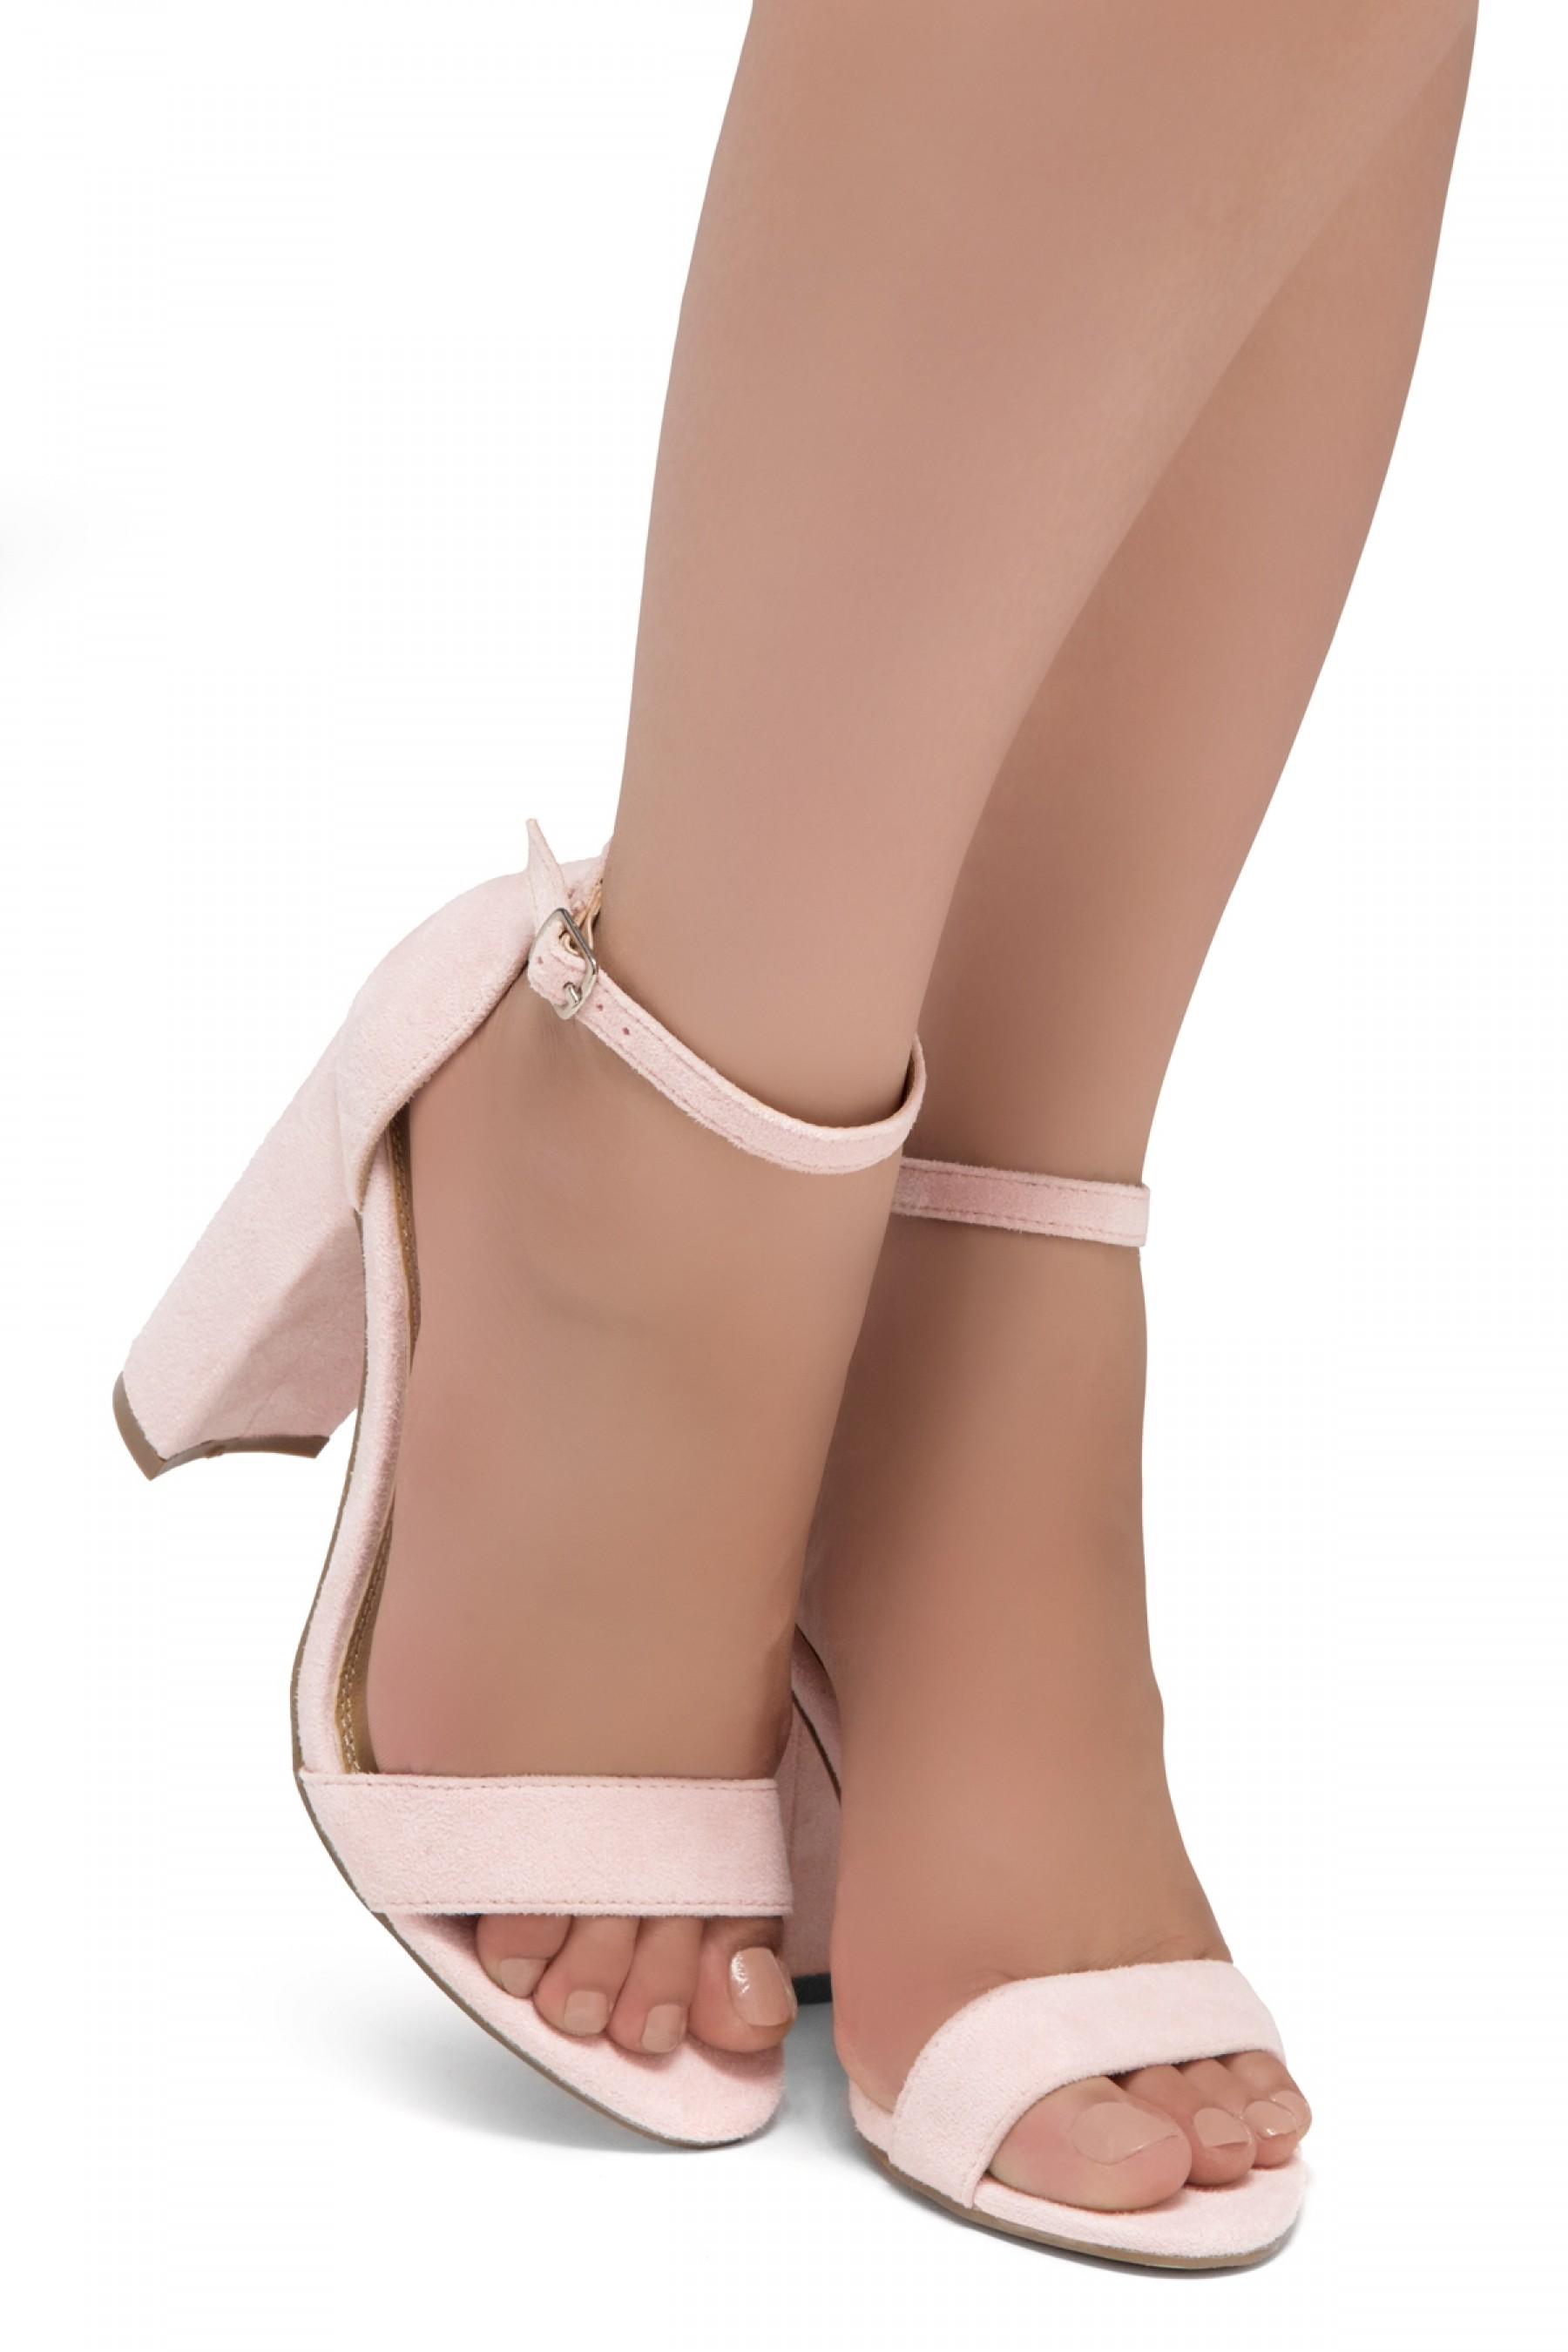 Shoe Land SL-Rosemmina Open Toe Ankle Strap Chunky Heel (Pink)